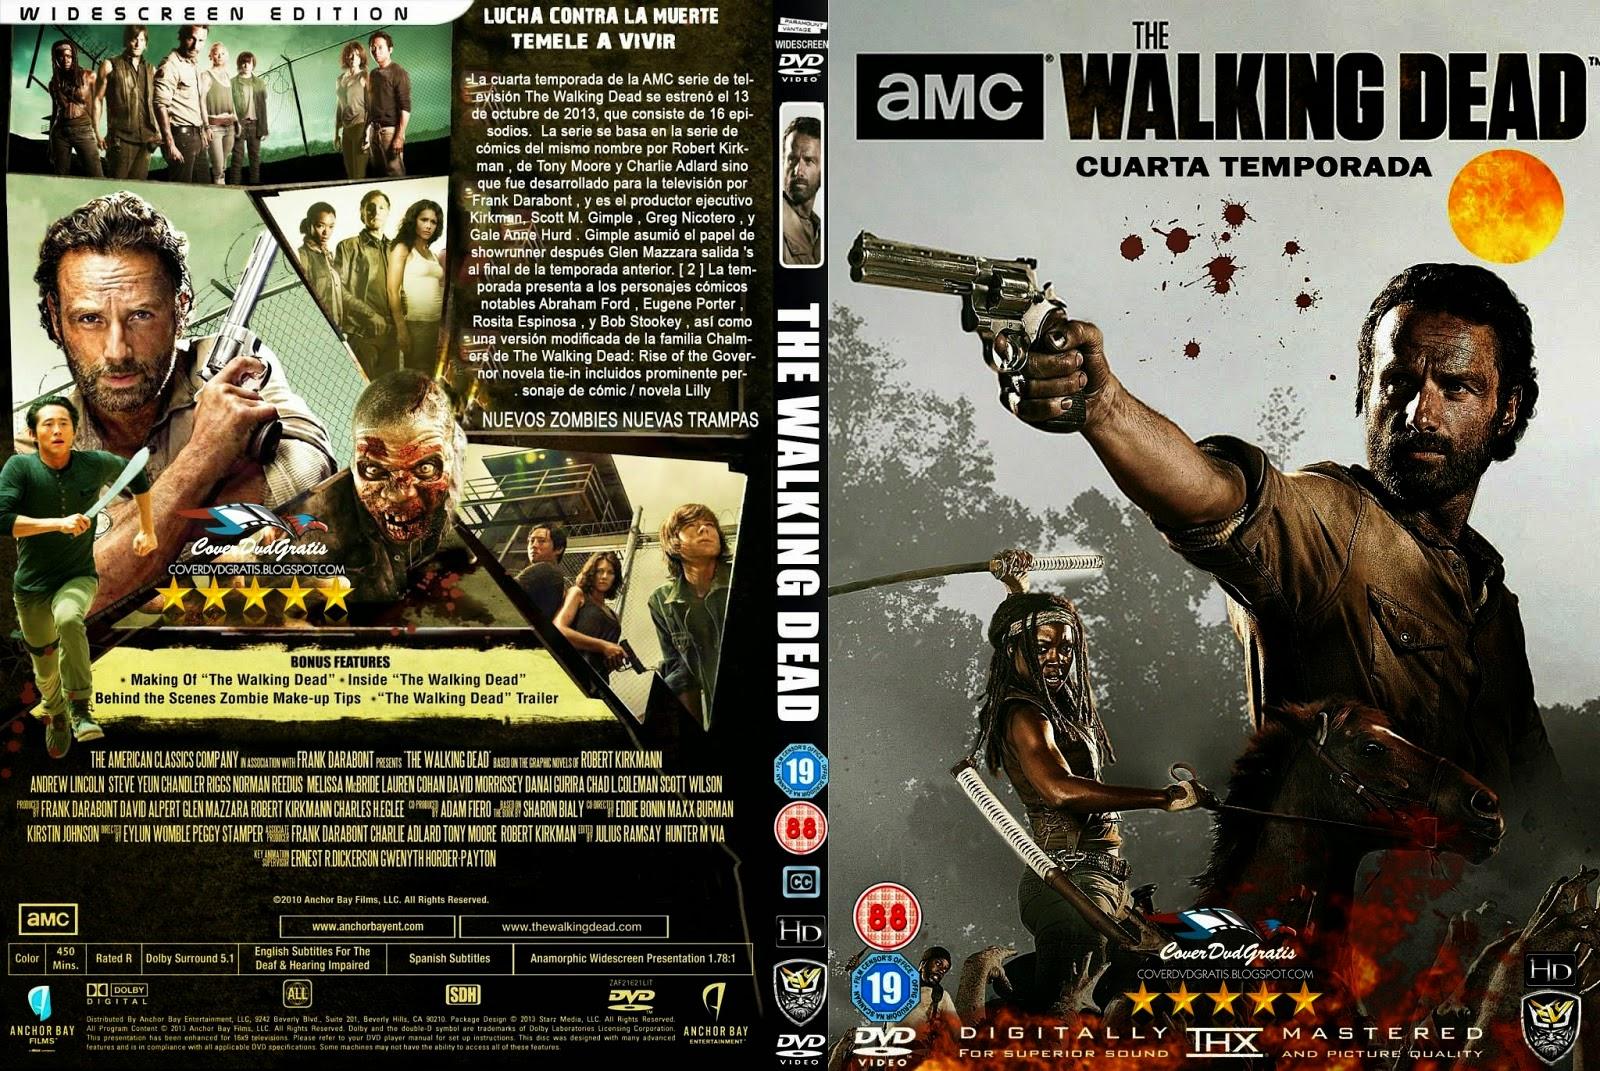 Serie walking dead cuarta temporada online / Bollyclips blu ray